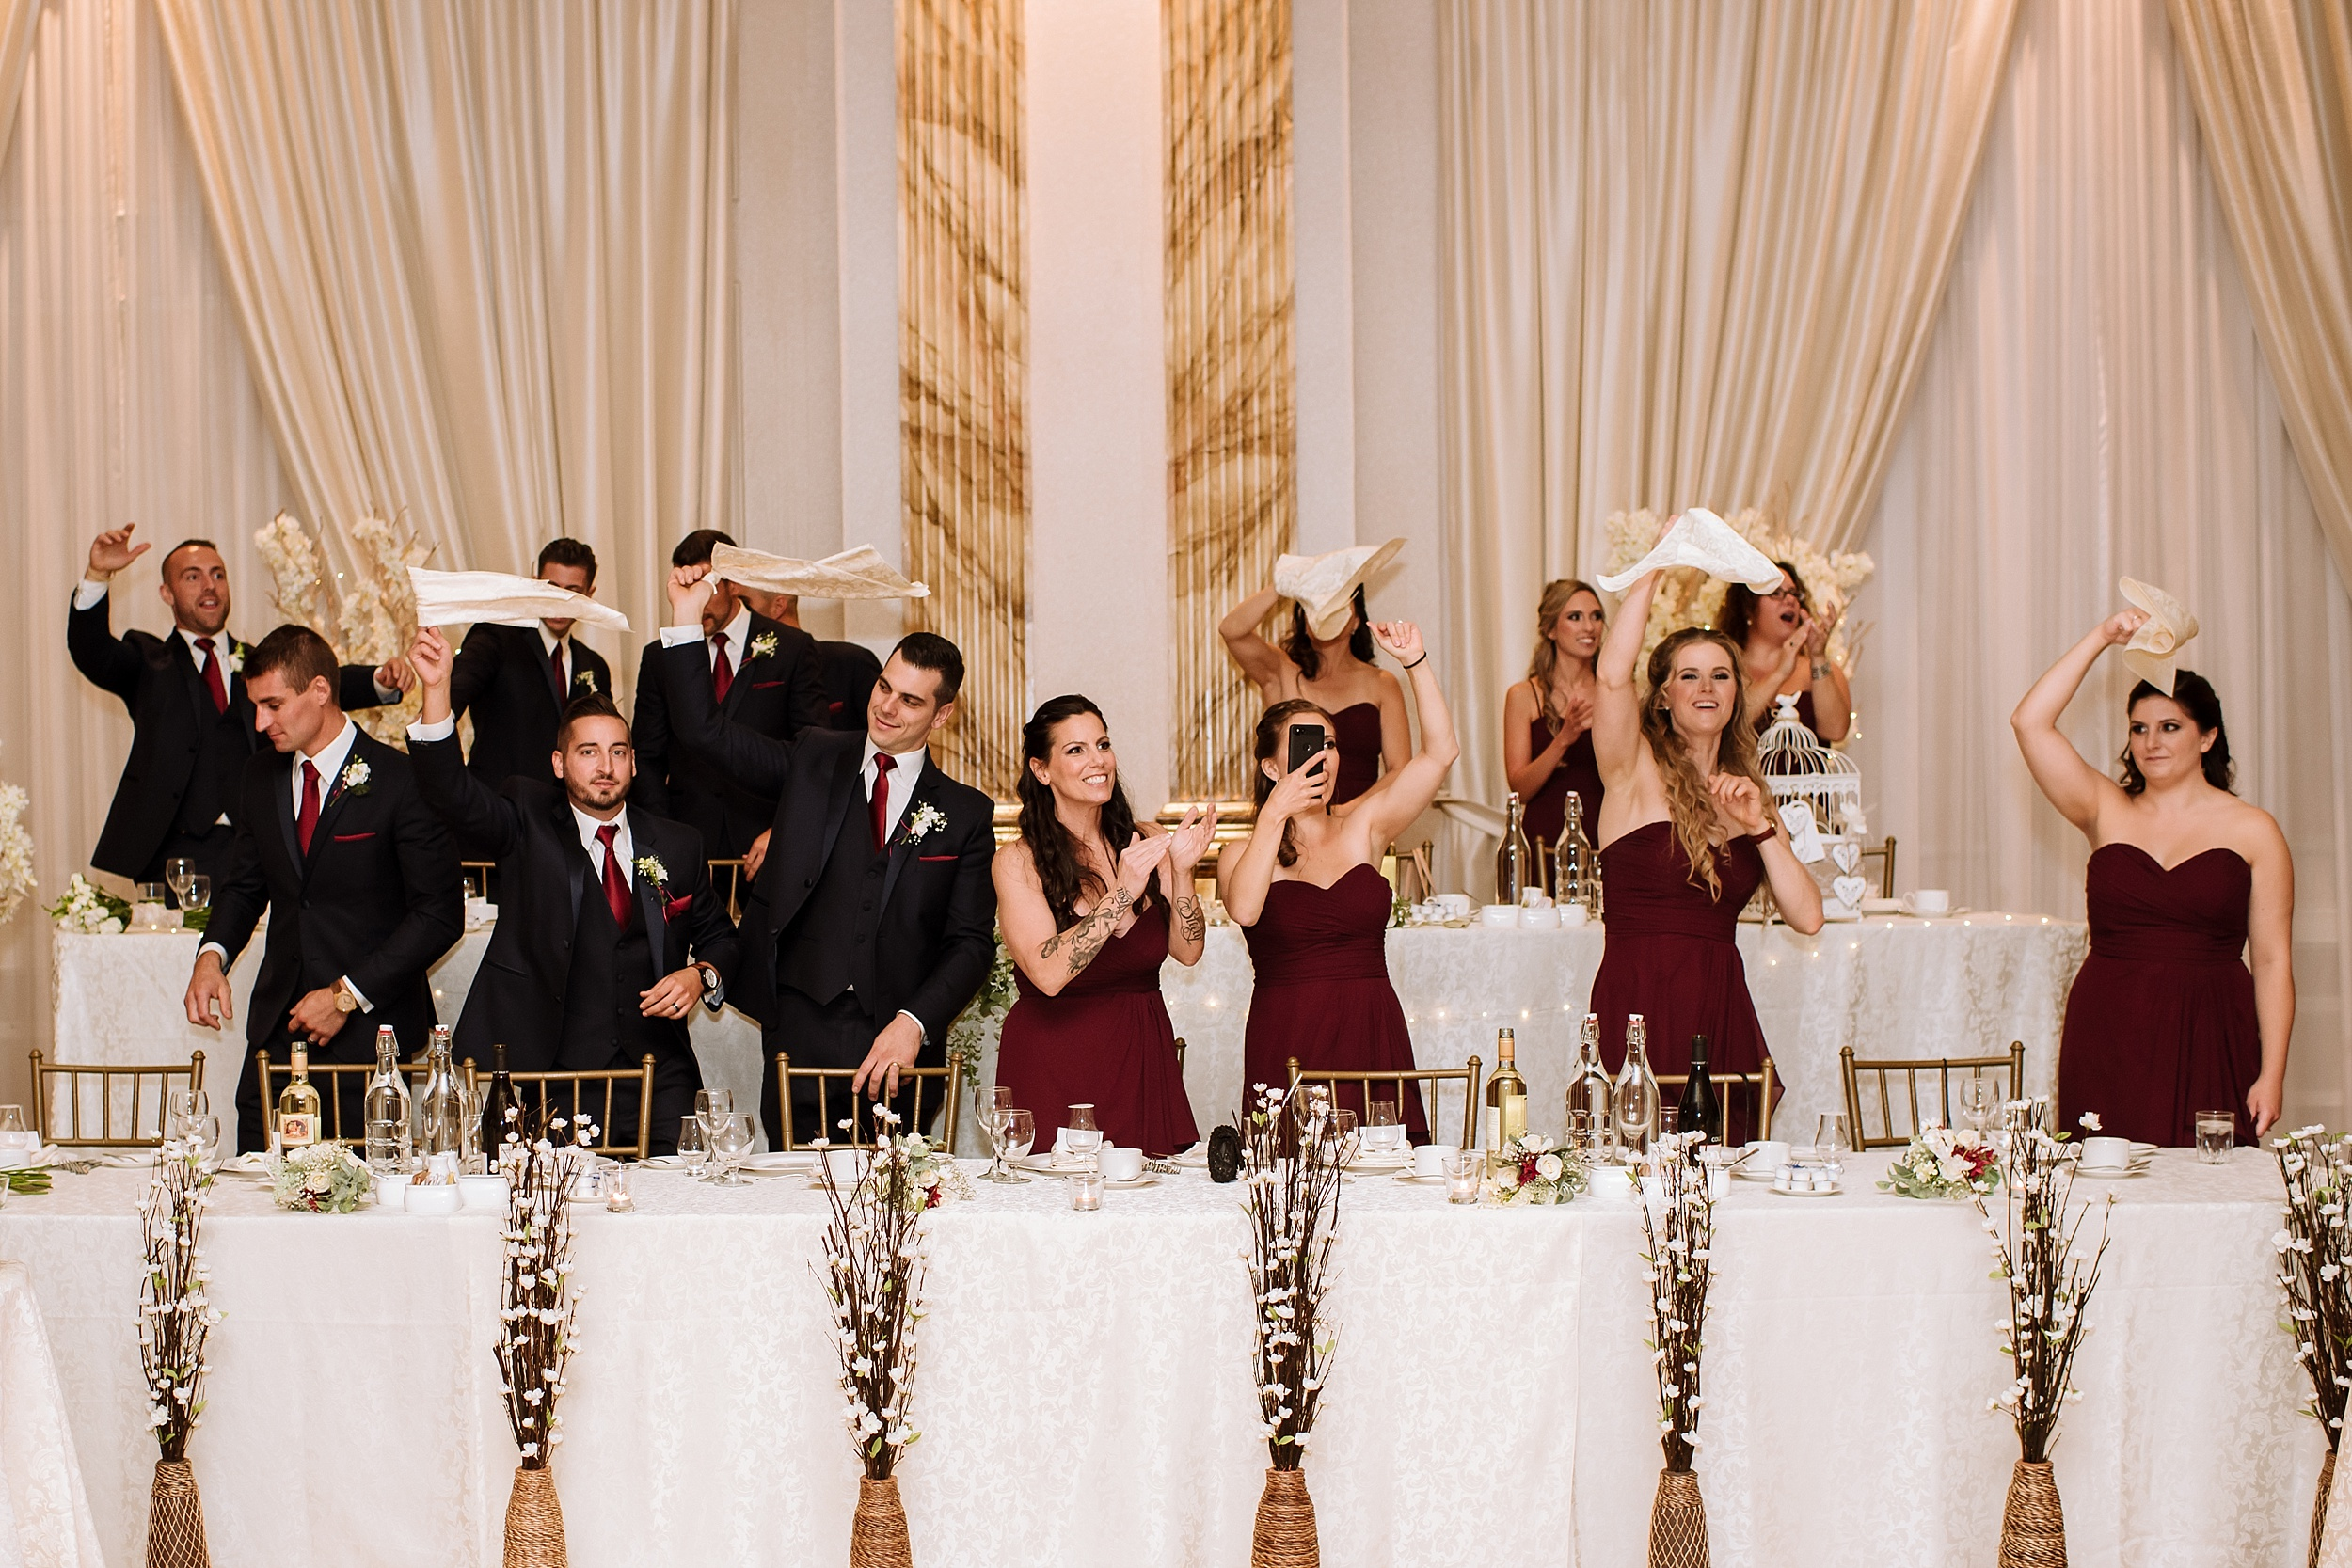 McMichael_Art_Collection_Wedding_chateau_le_jardin_Justine_Munro_Toronto_Photographer067.jpg